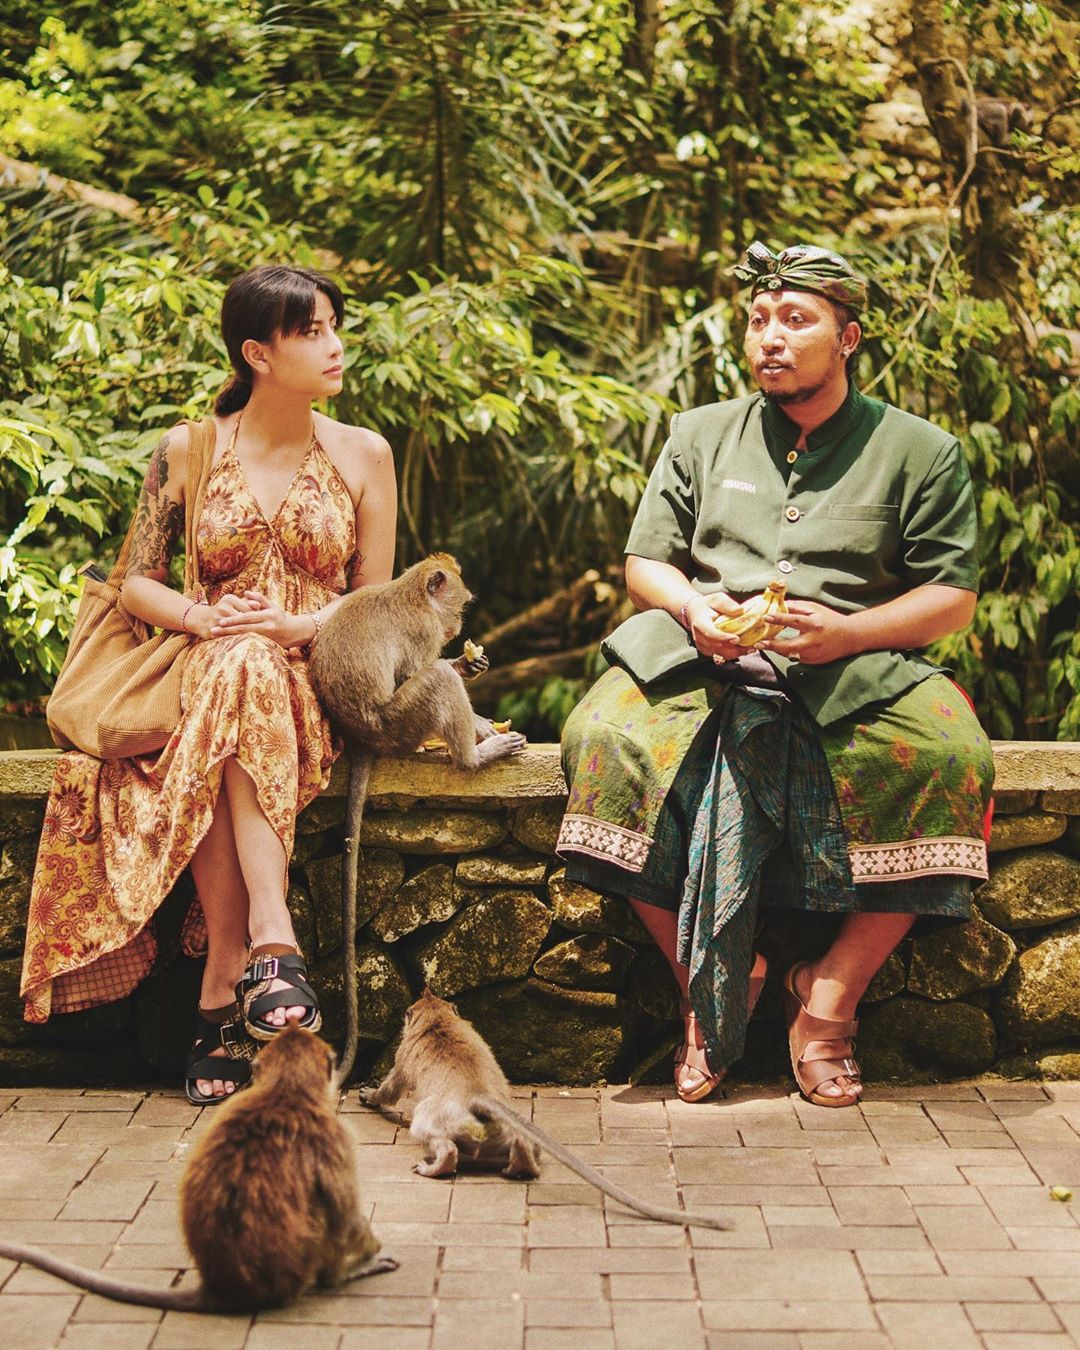 Sejarah Monkey Forest Ubud Bali Kelana Karin Awkarin - Dewata ID